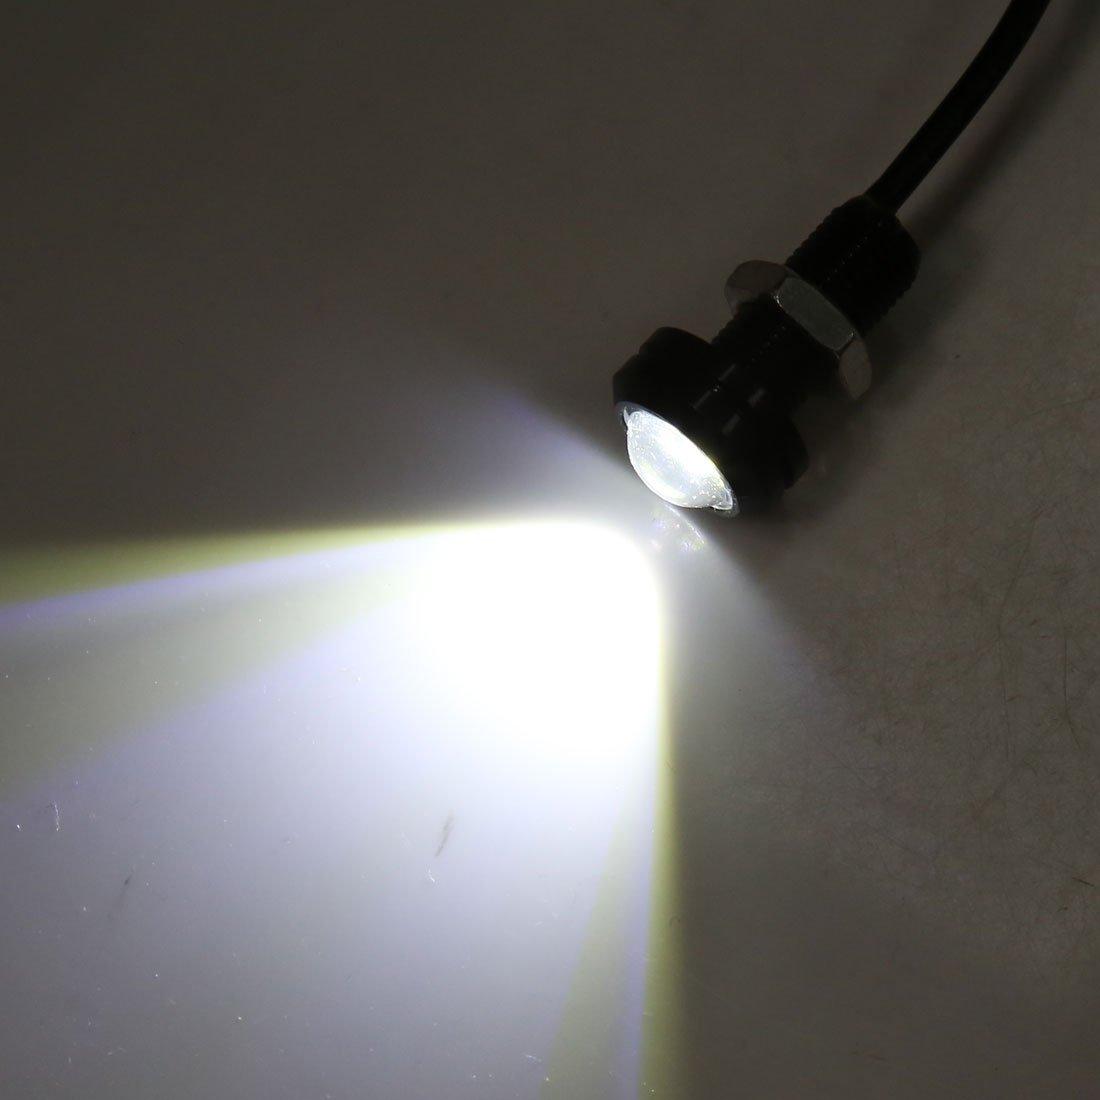 Amazon.com: eDealMax 12pcs Blanco 5630 SMD 2 LED DE 18 mm de Eagle Eye coche parachoques DRL luz de niebla de 12V 1.5W: Automotive